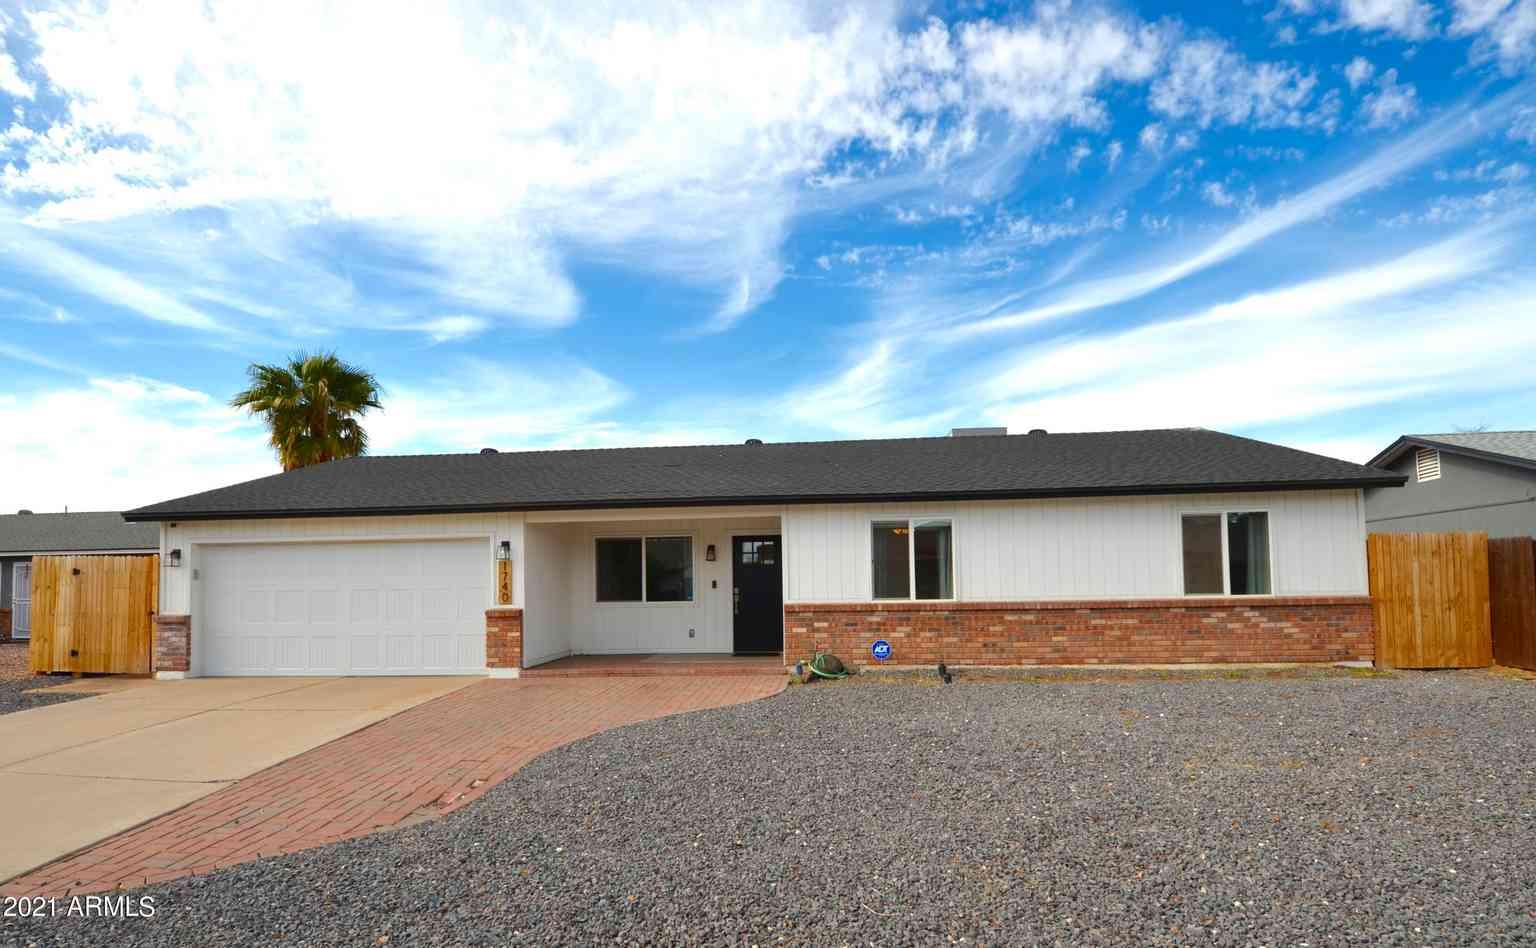 1740 S GLENVIEW --, Mesa, AZ, 85204,